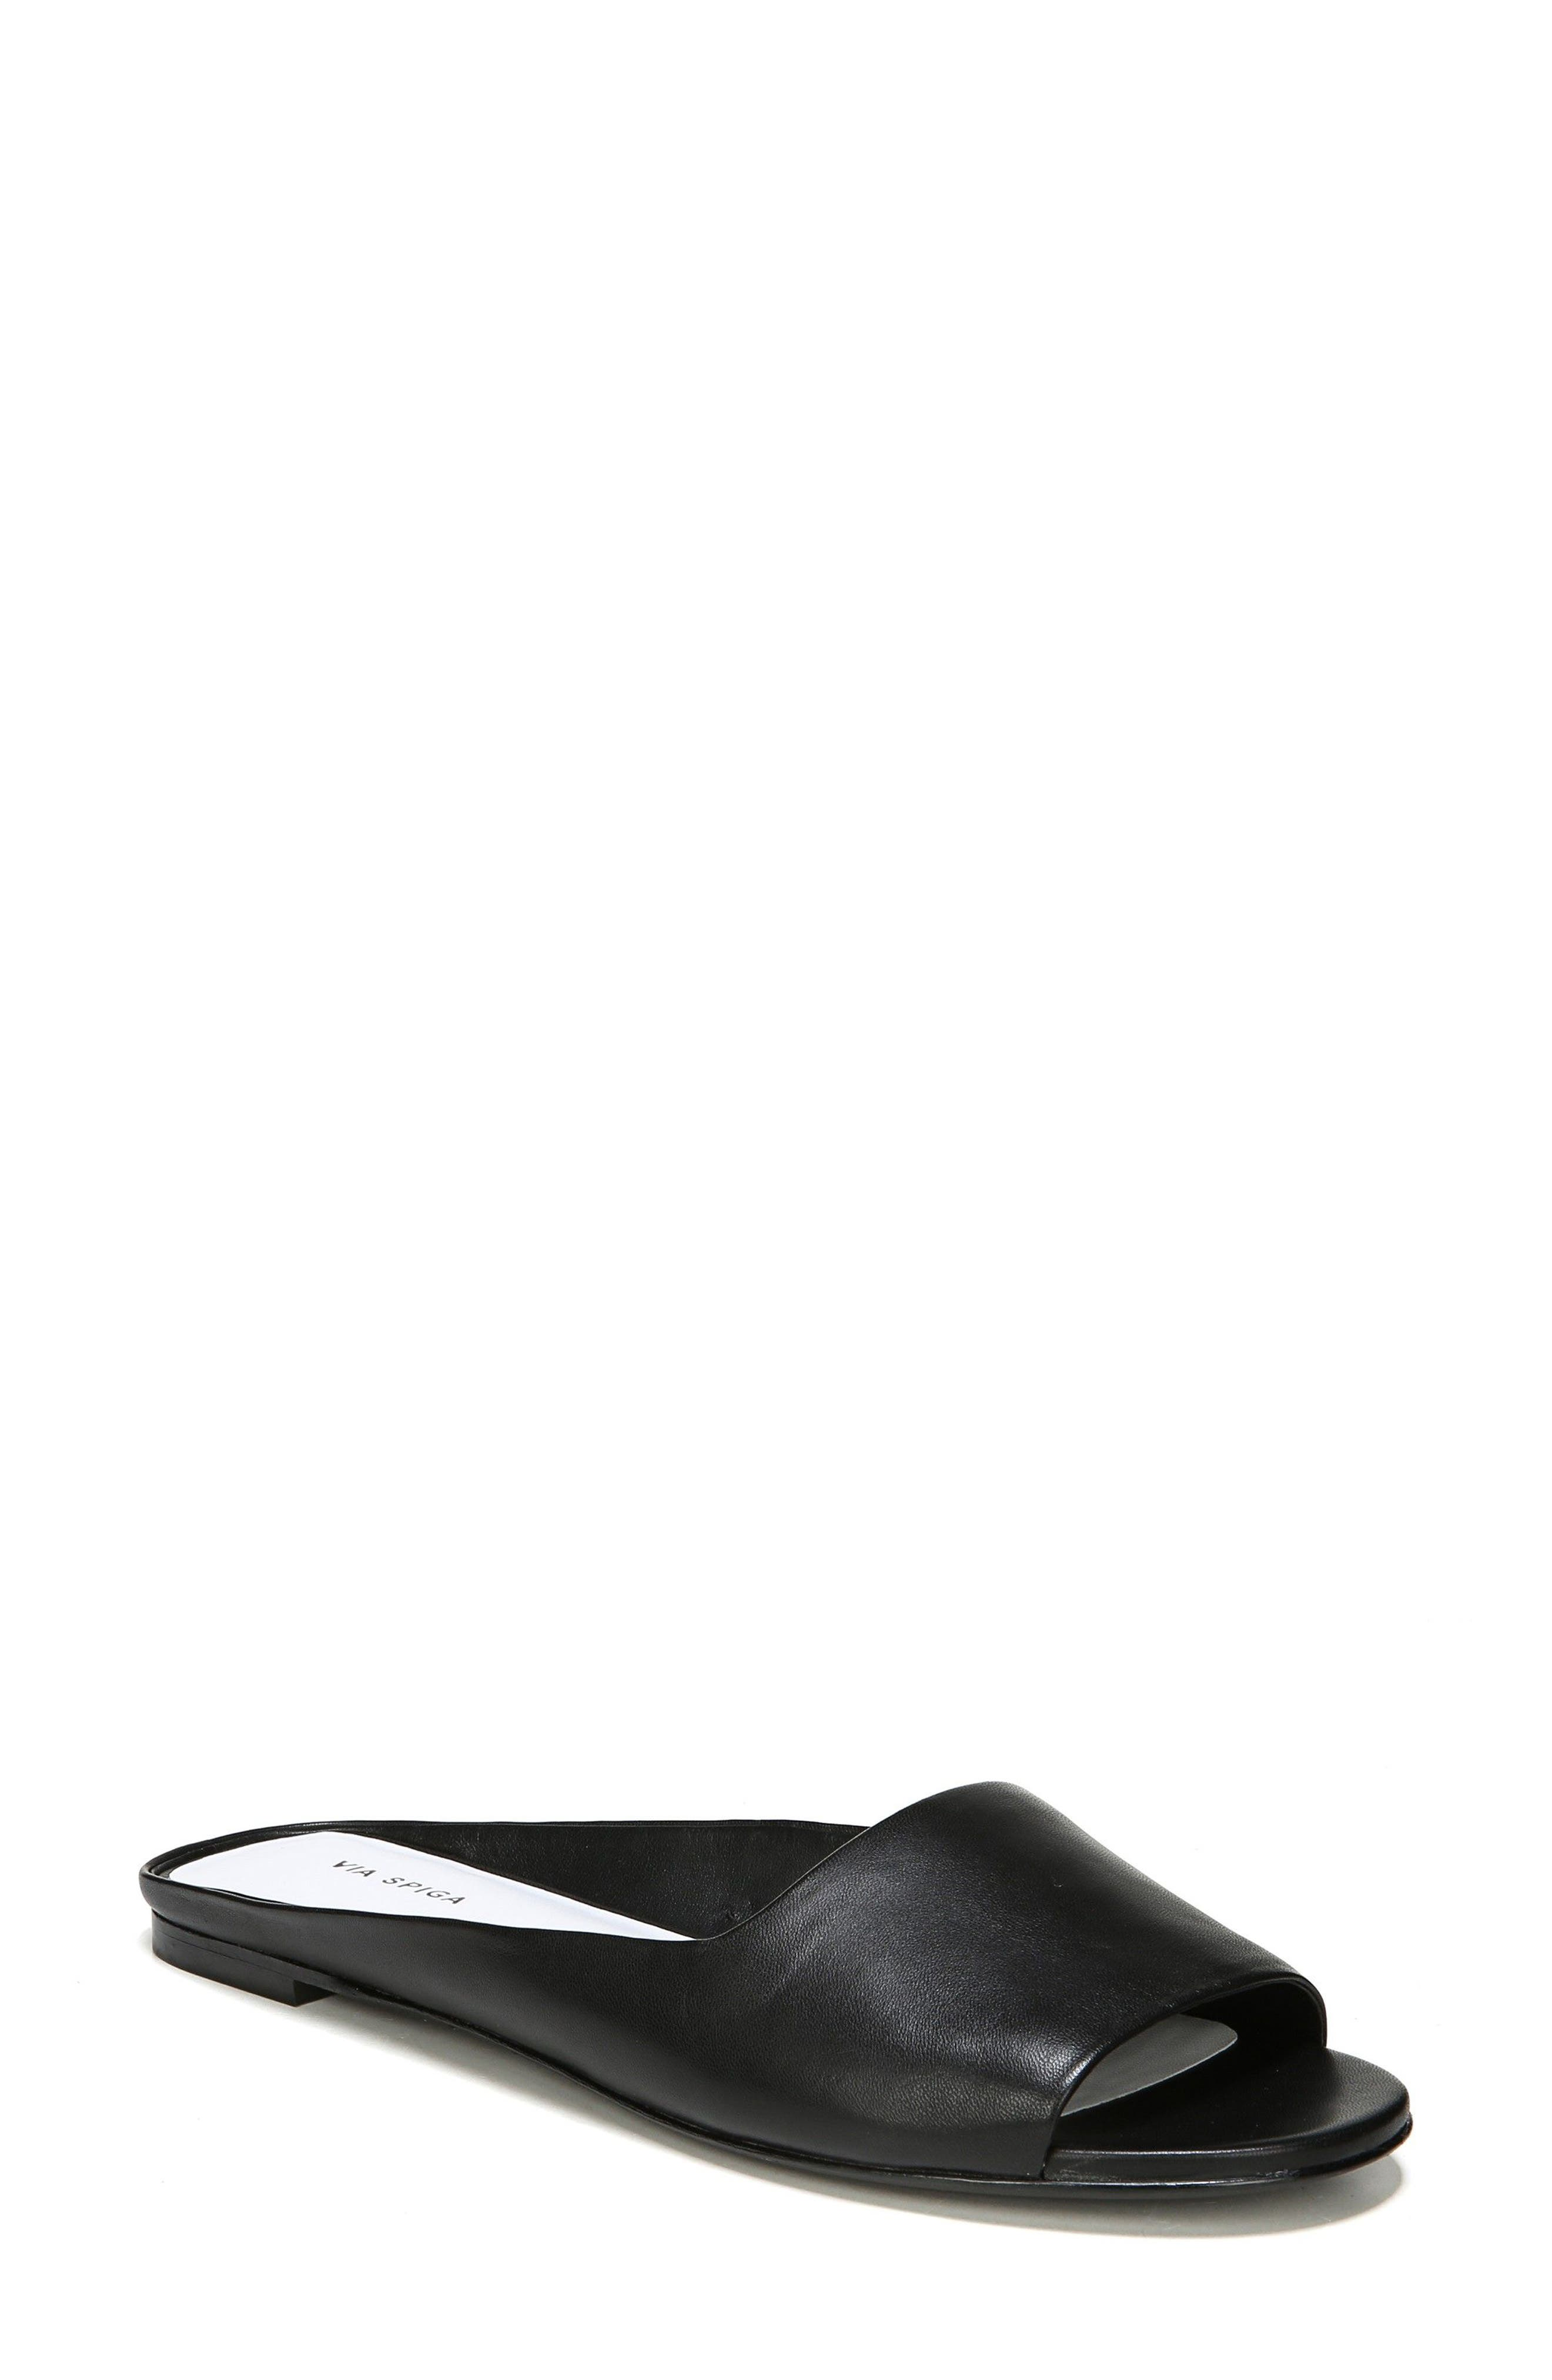 Hana Slide Sandal,                         Main,                         color, 003